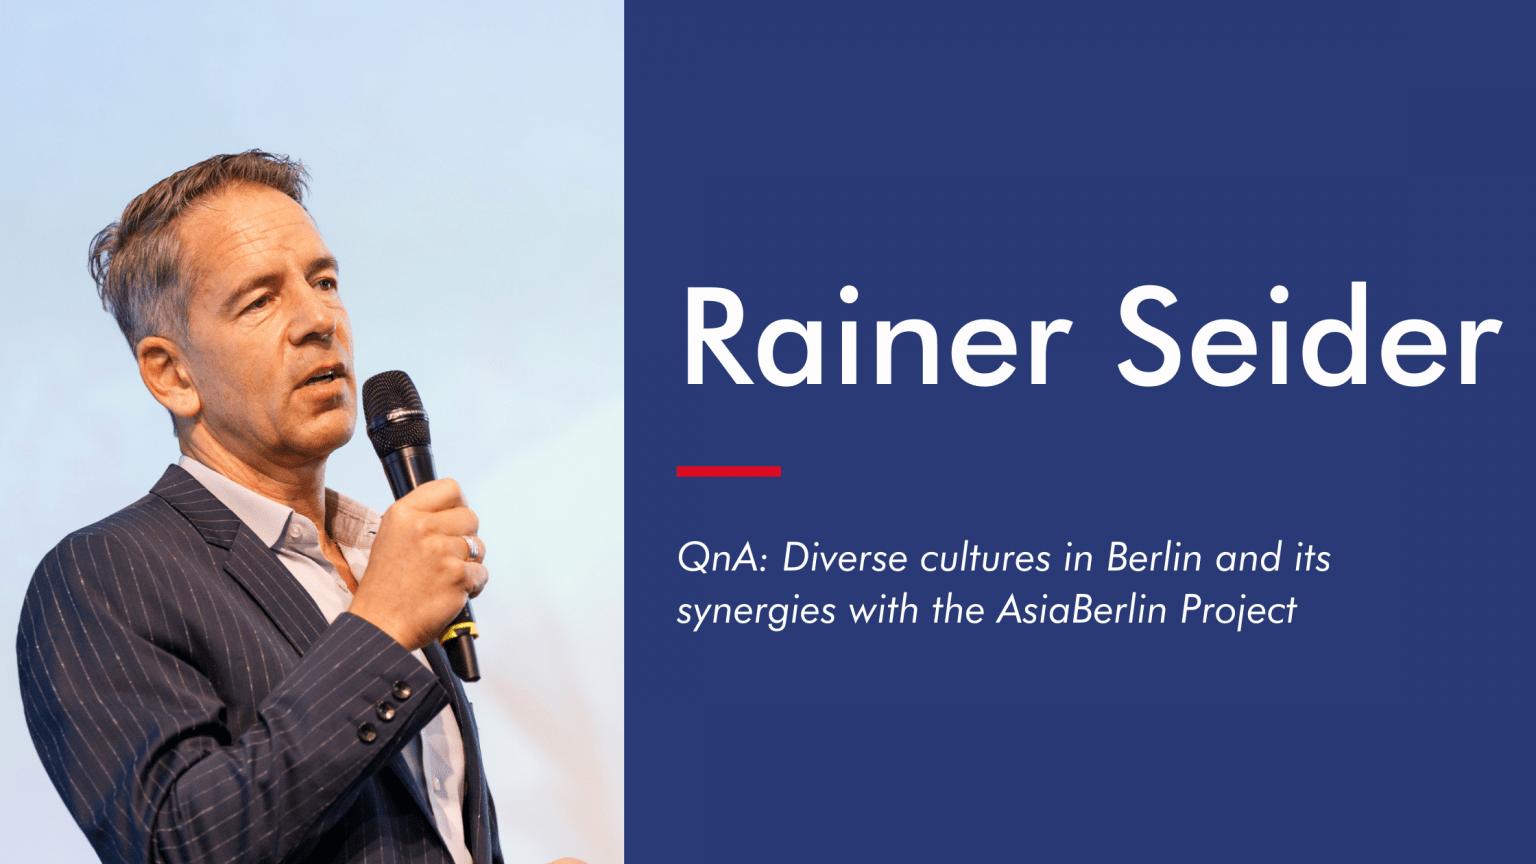 Rainer Seider, Initiator of Asiaberlin on building international & diverse cultures in Berlin